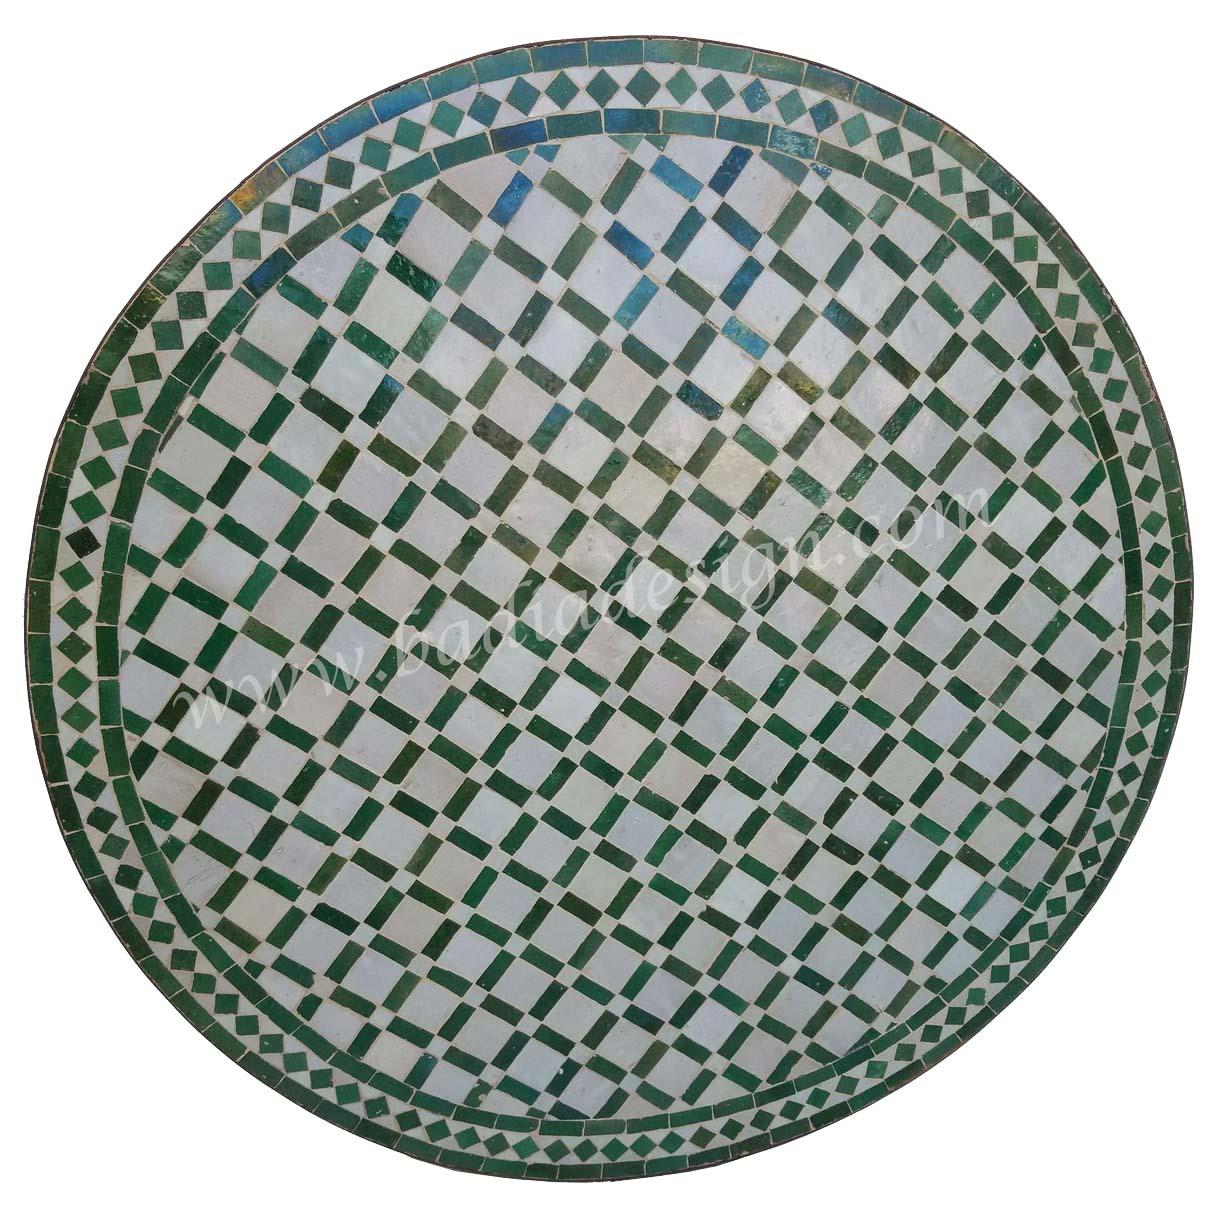 moroccan-tile-table-top-new-york-mtr438a.jpg